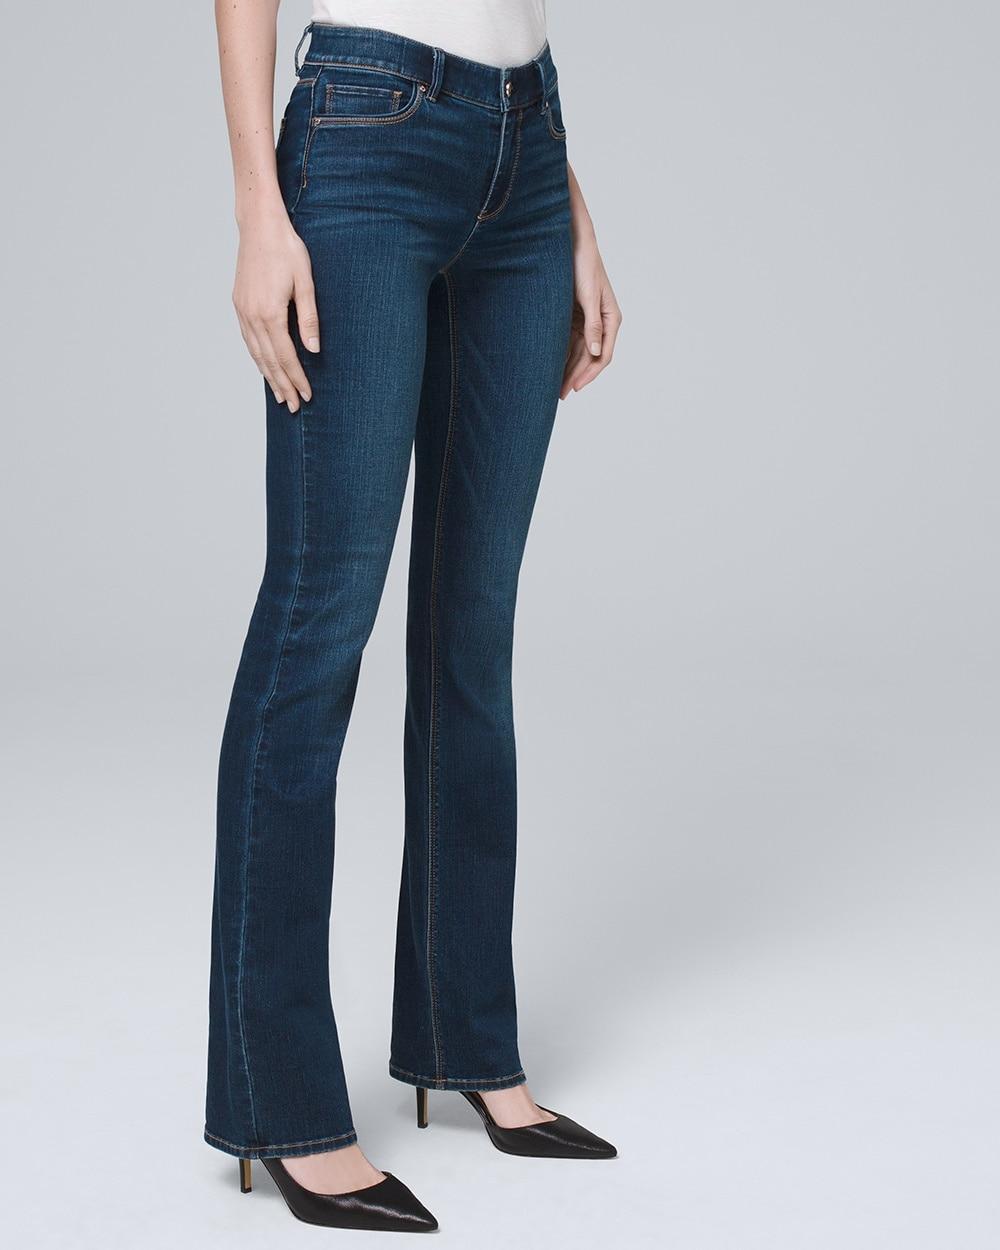 bc669323988 Mid-Rise Bootcut Jeans - White House Black Market